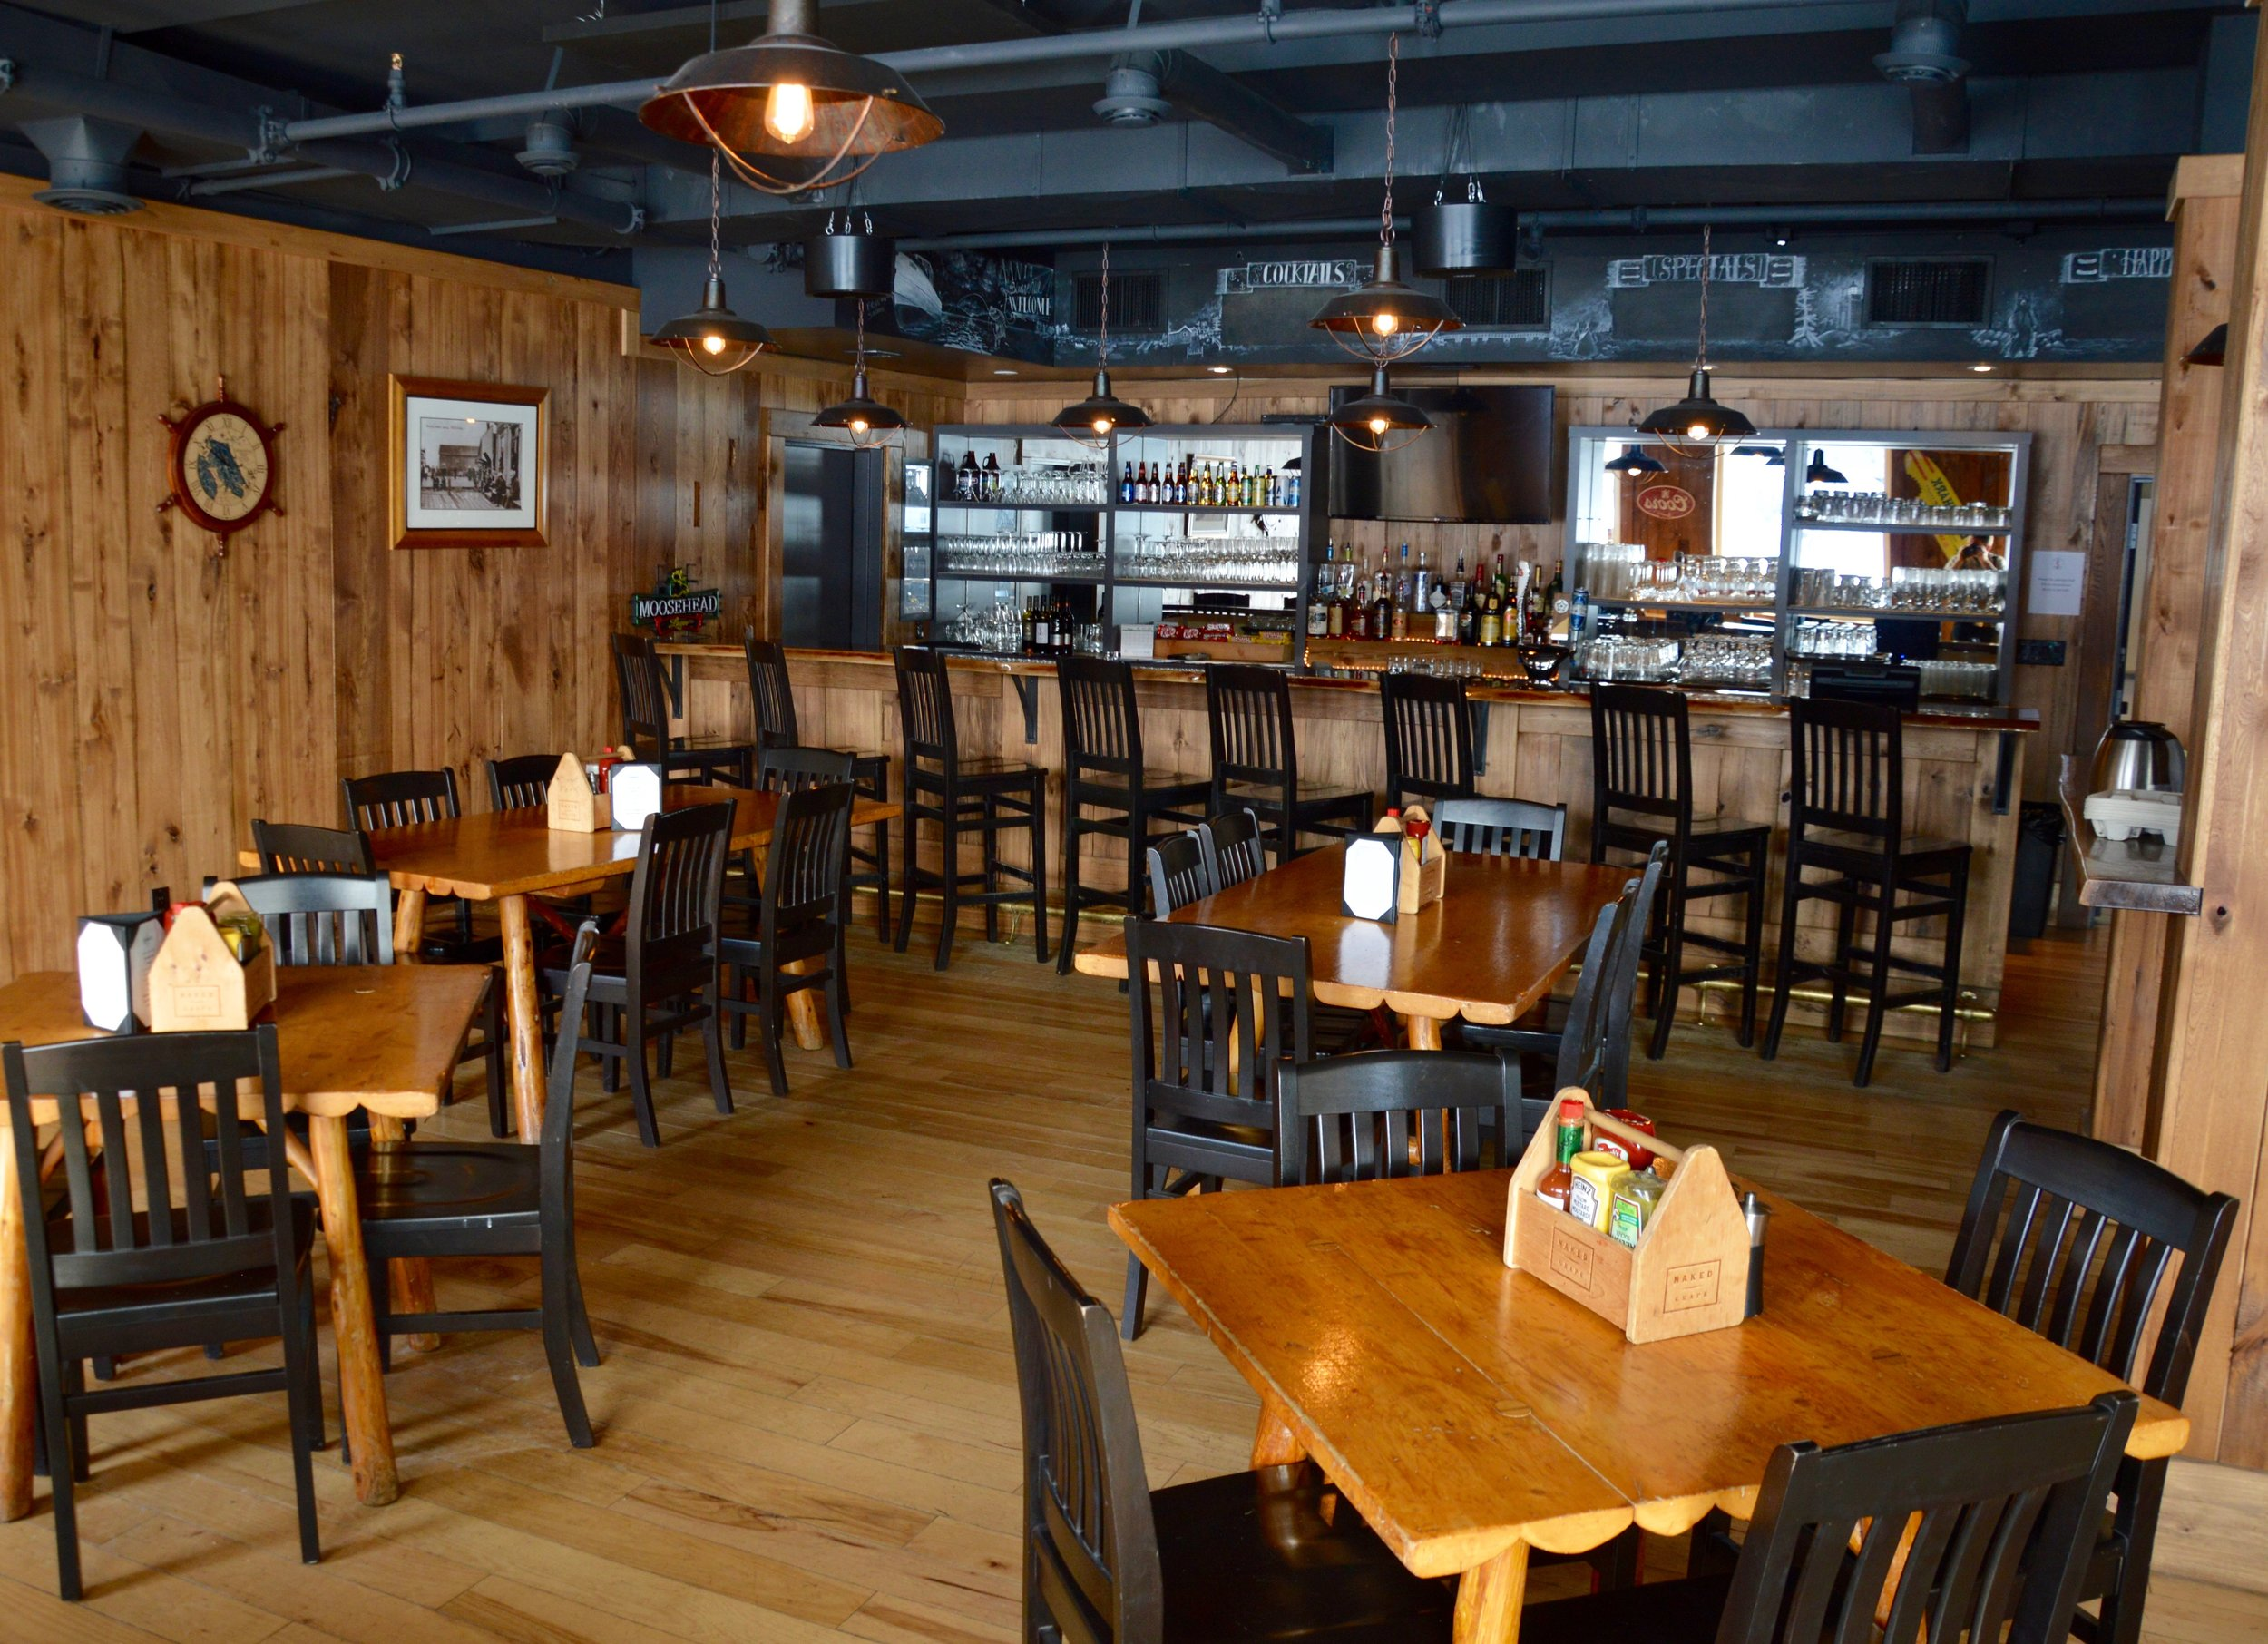 The bar at the Sportsman's Inn in Killarney, Ontario